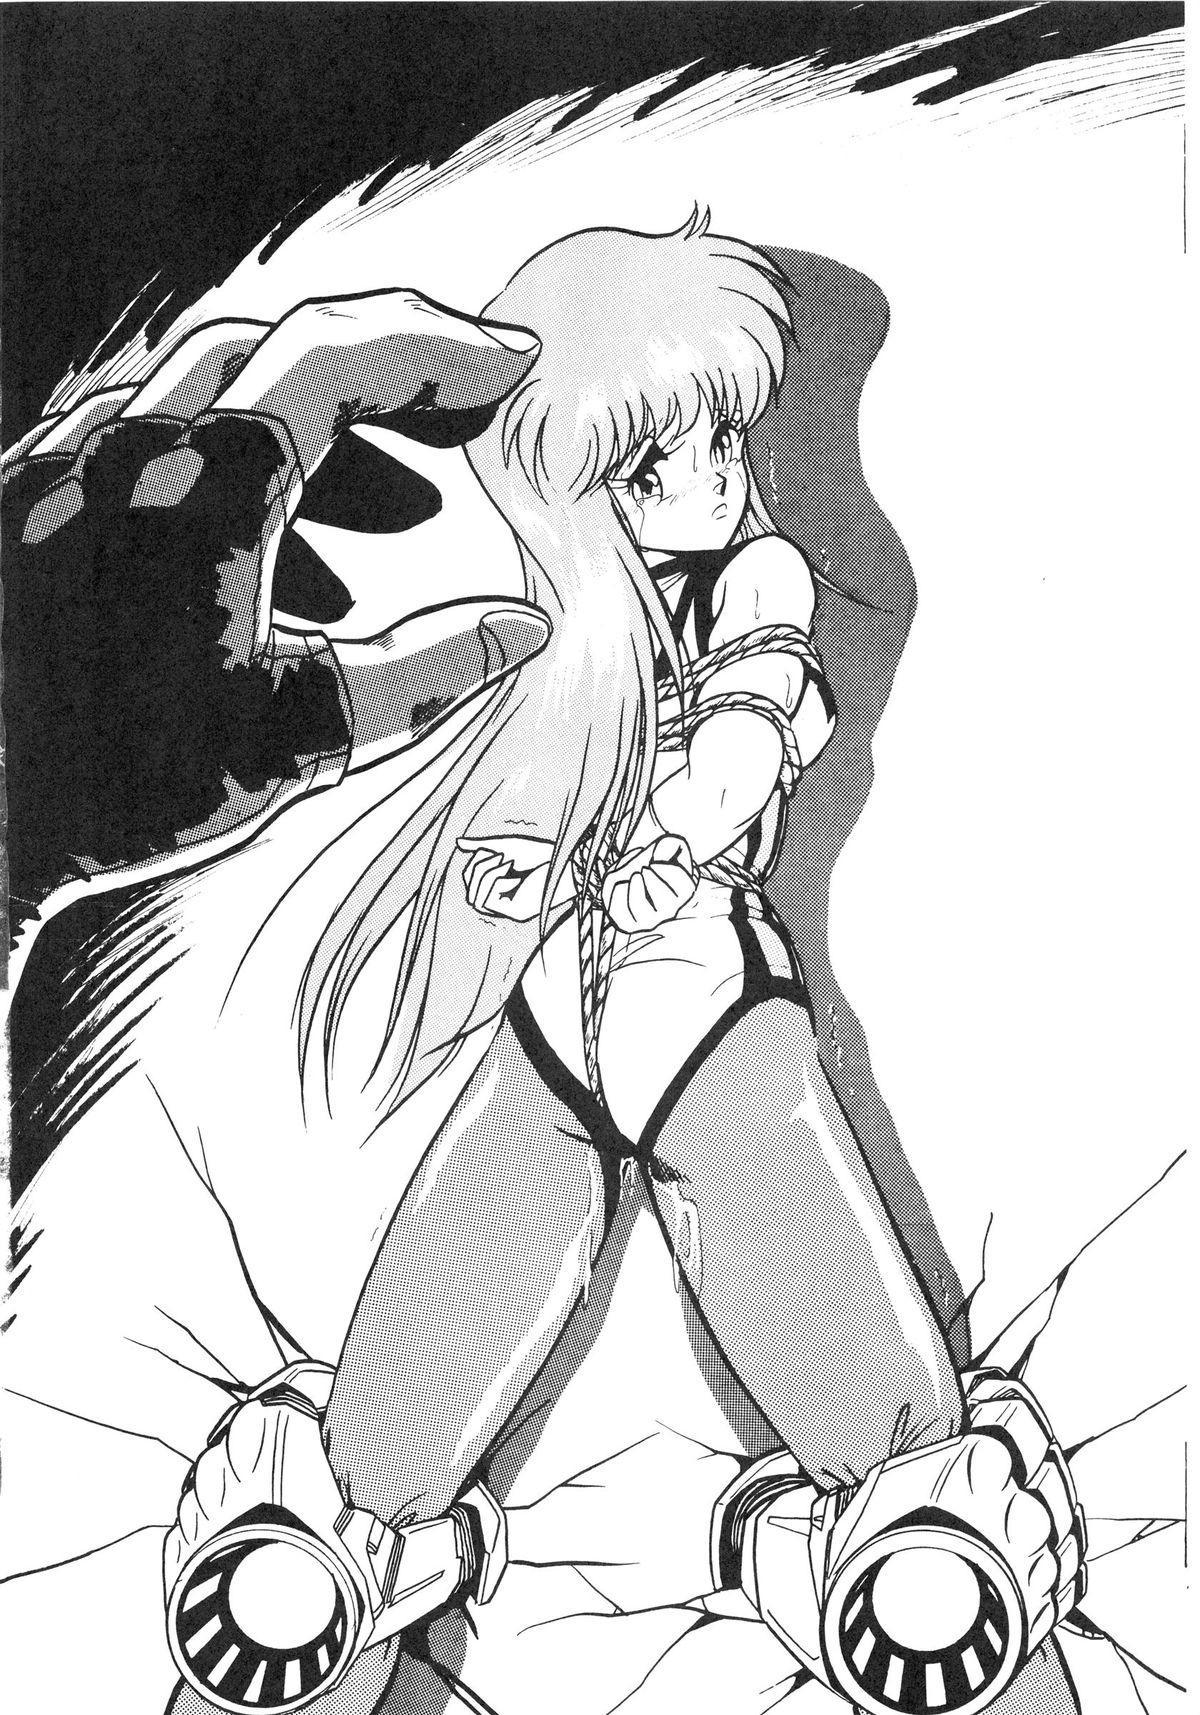 Hobaku Douga Musume - Zouho Kaiteiban 11